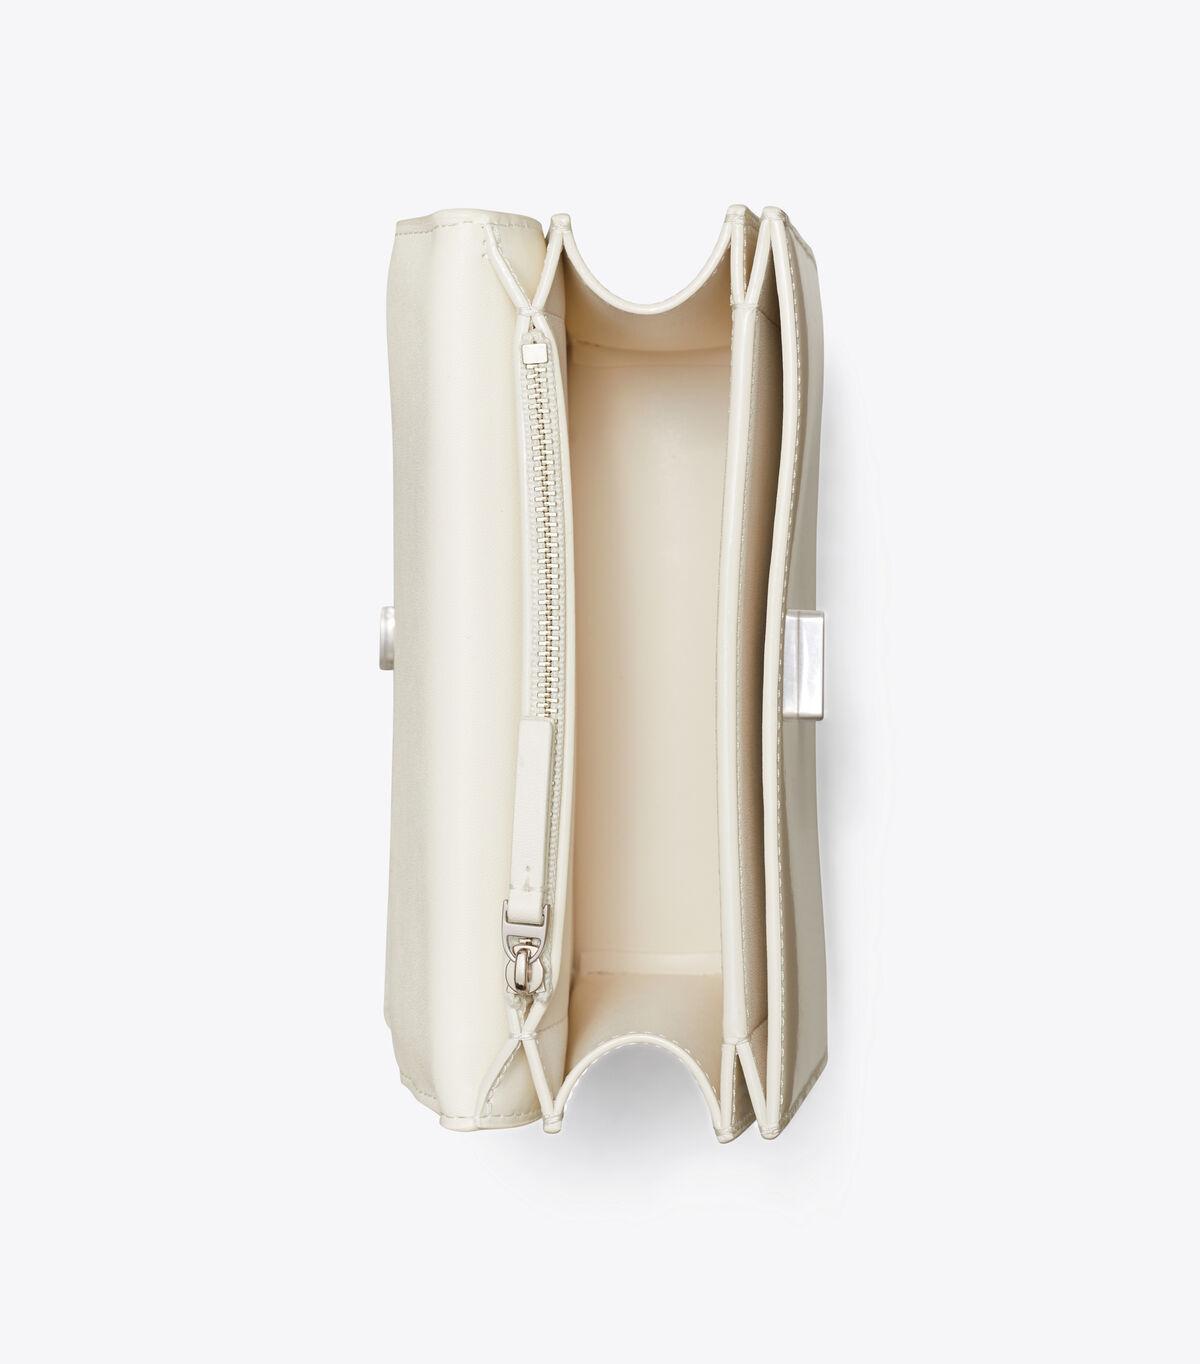 ELEANOR PATENT SMALL CONVERTIBLE SHOULDER BAG